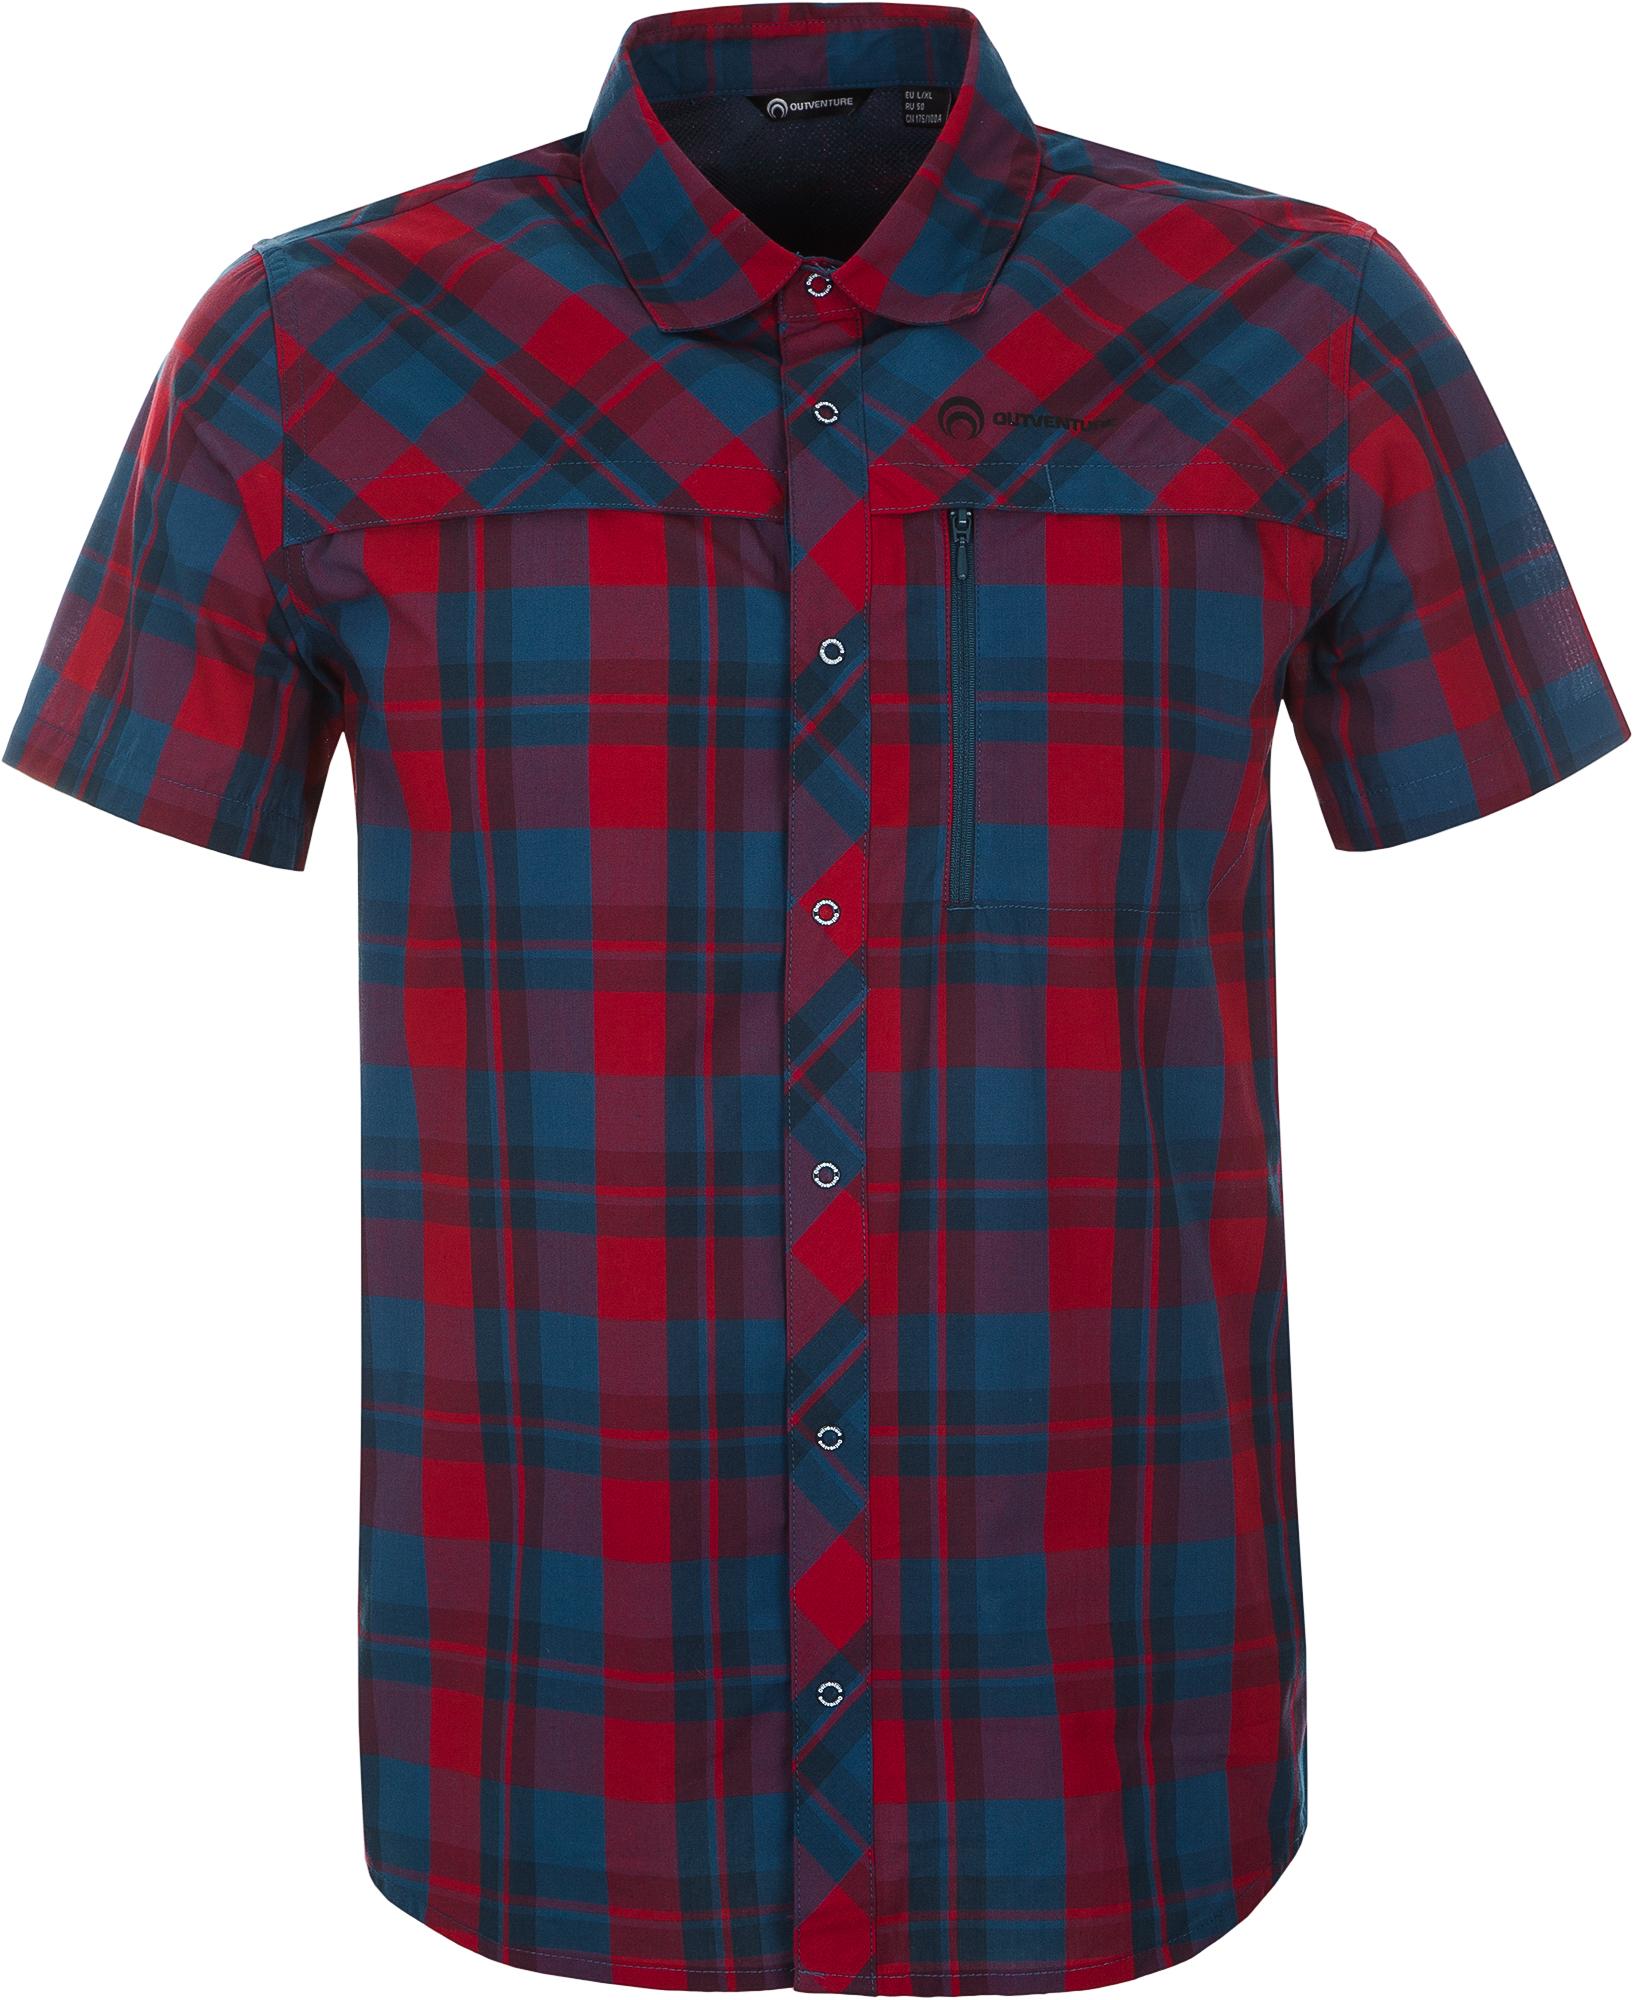 Outventure Рубашка мужская Outventure, размер 60